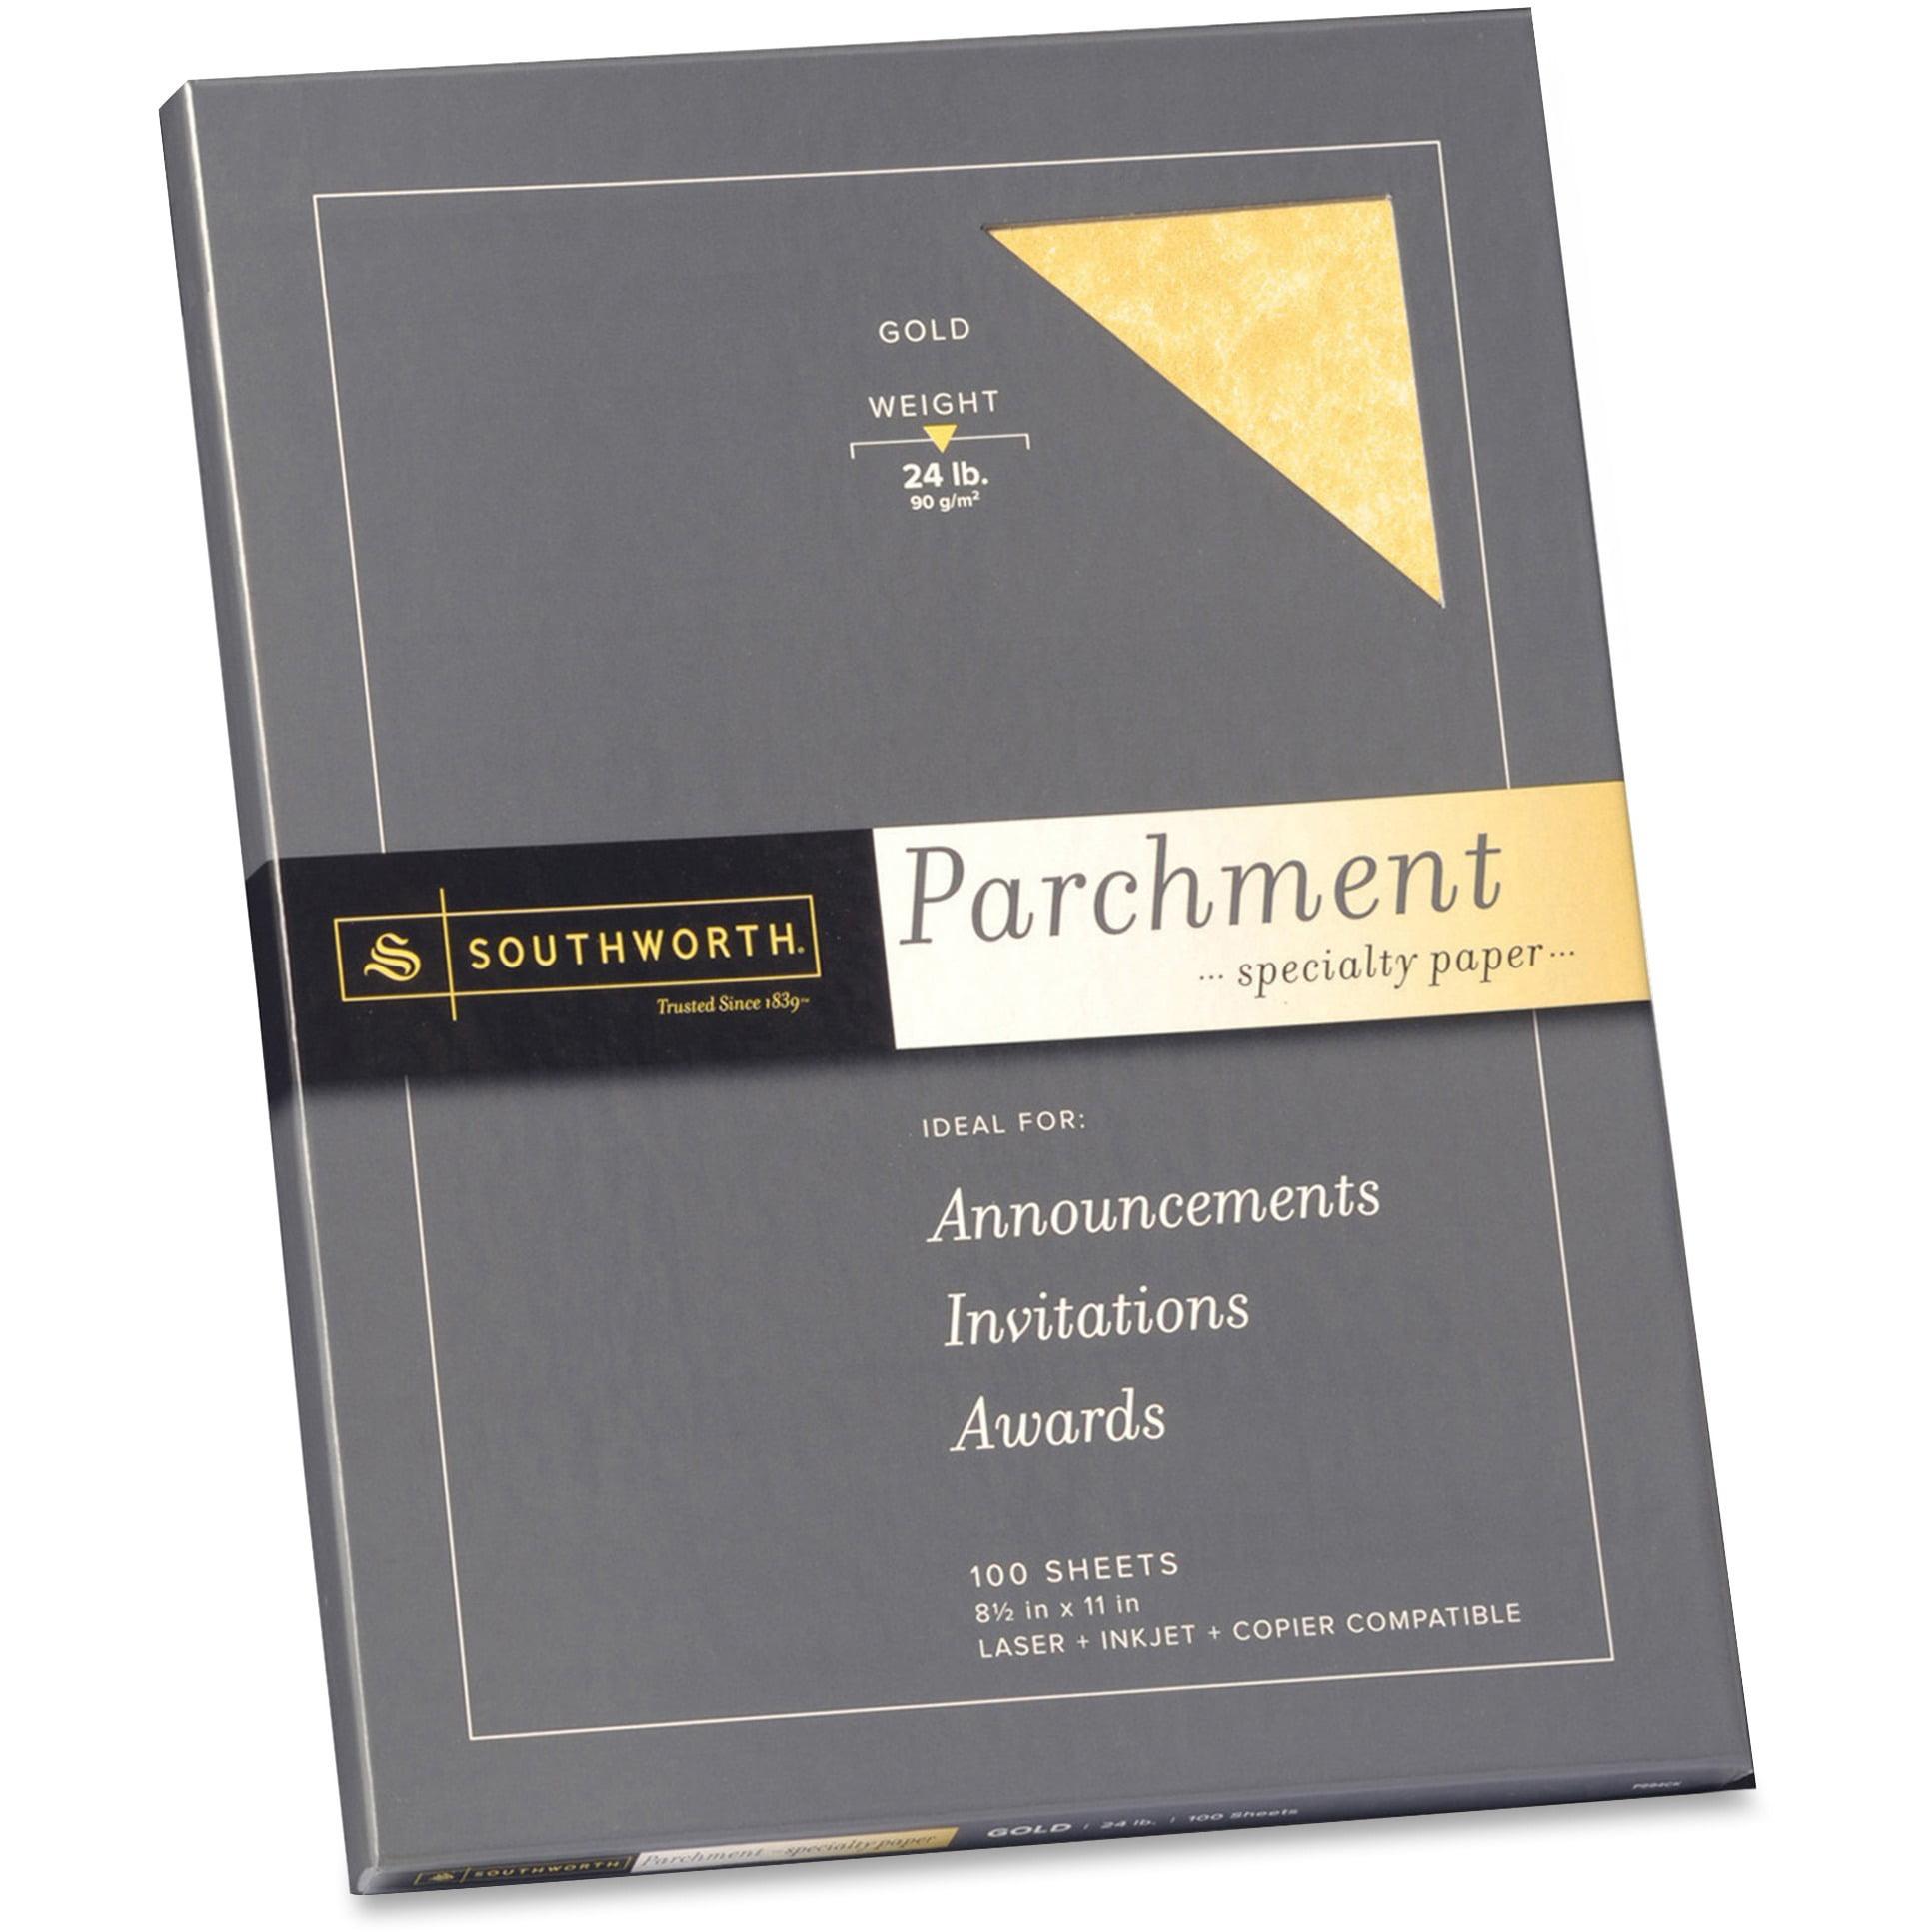 Southworth, SOUP994CK, Parchment Specialty Paper, 100 / Pack, Gold